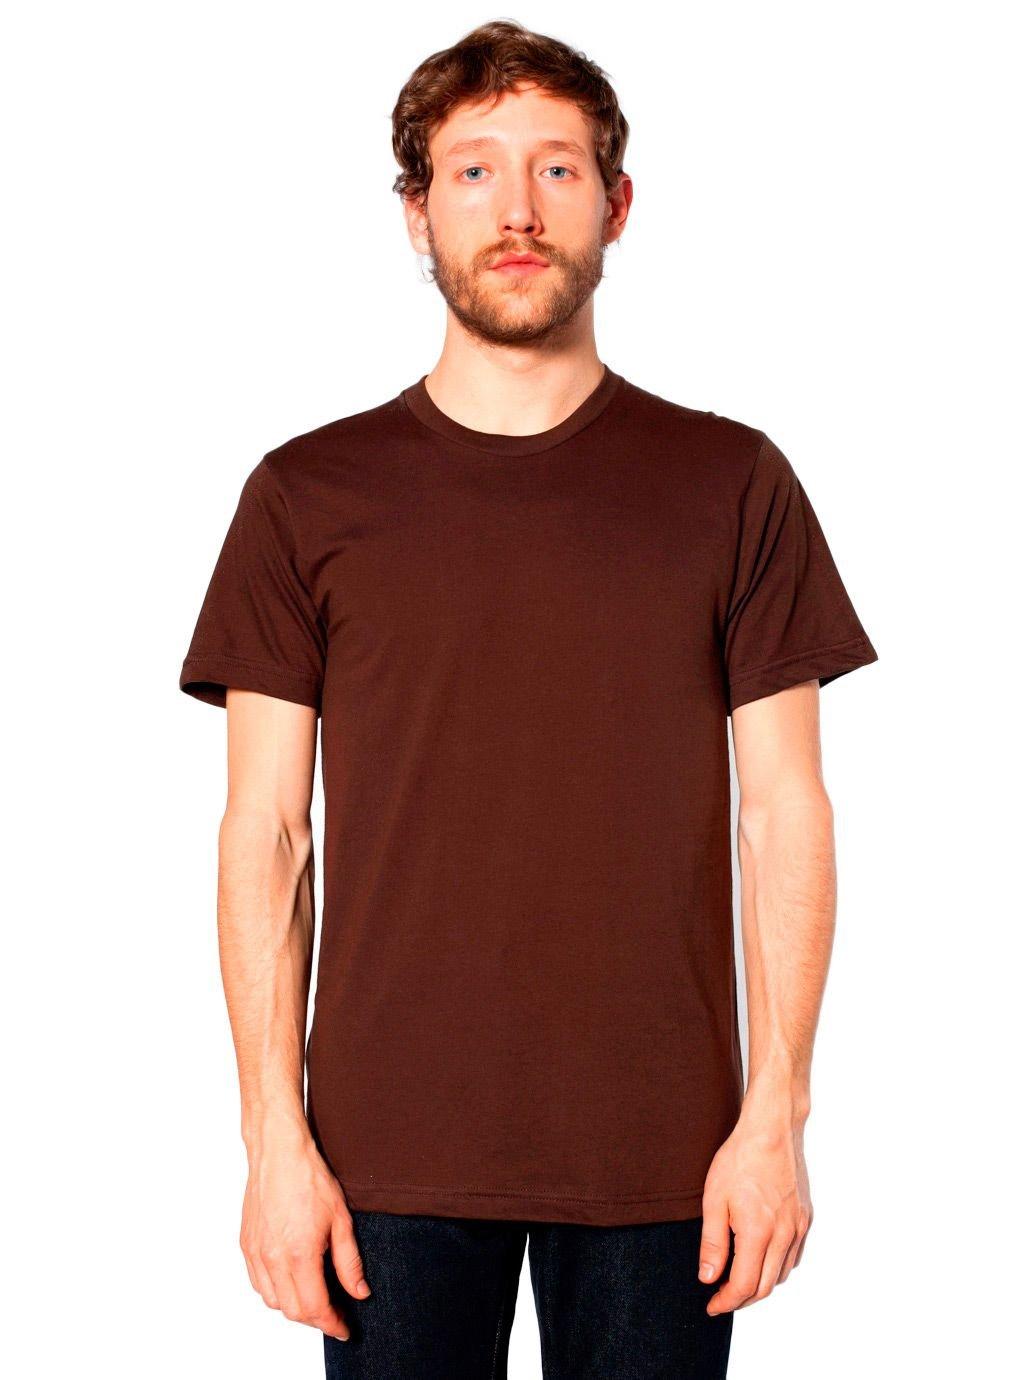 American Apparel Men's Unisex Fine Jersey Short Sleeve T-Shirt American Apparel Mens 2001